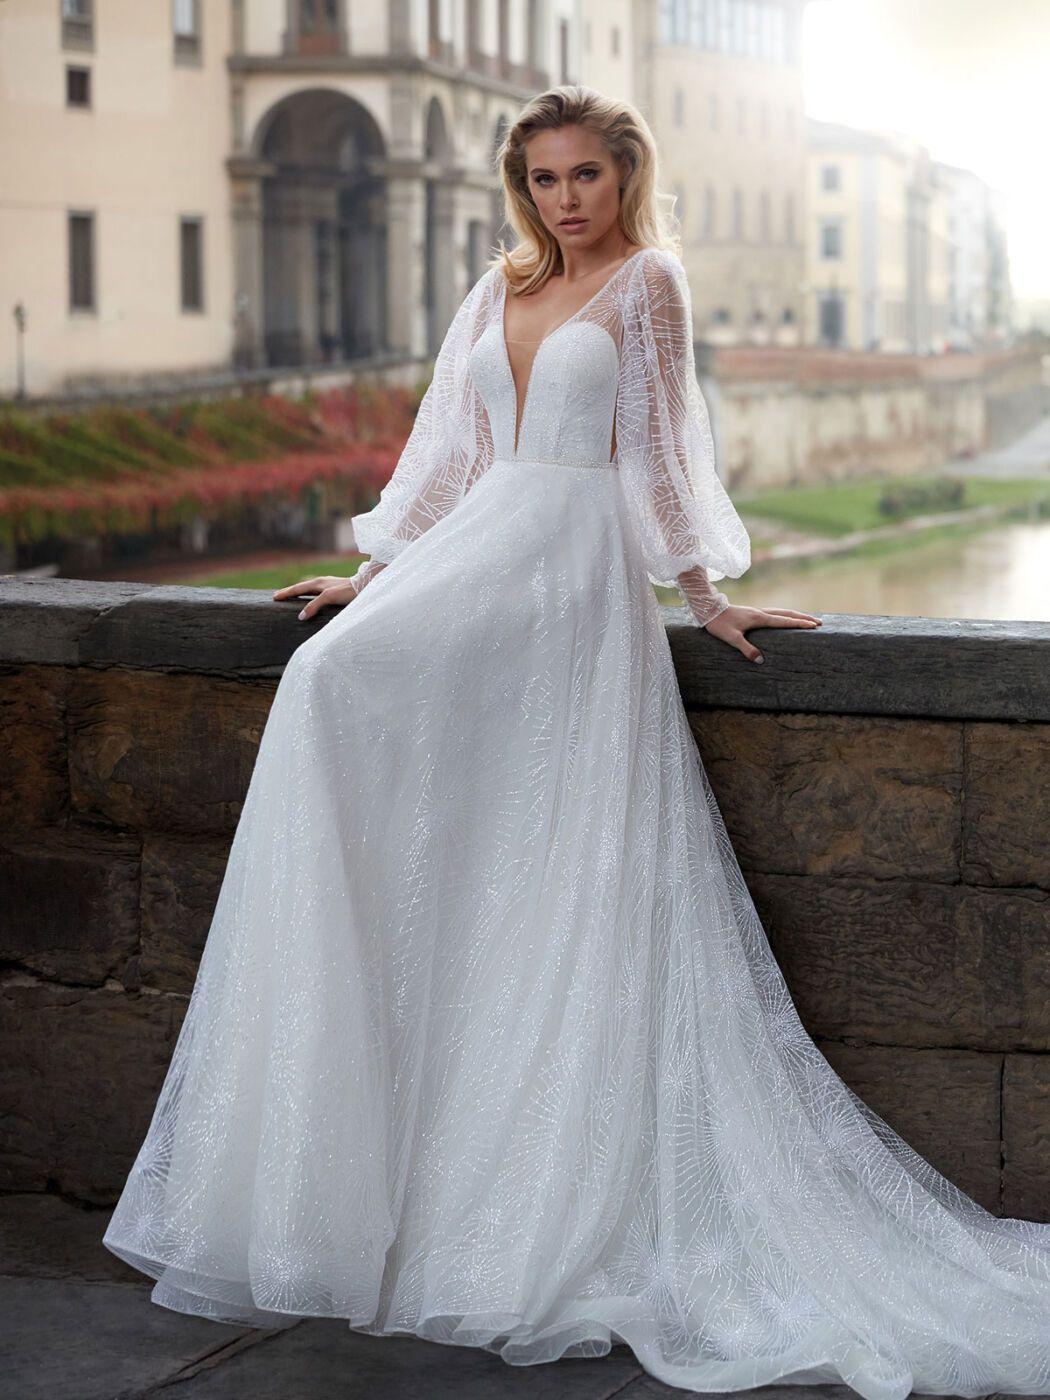 https://www.weddingmagazine.com.ua/wp-content/uploads/2020/06/nicole-2021-milano-5.jpg